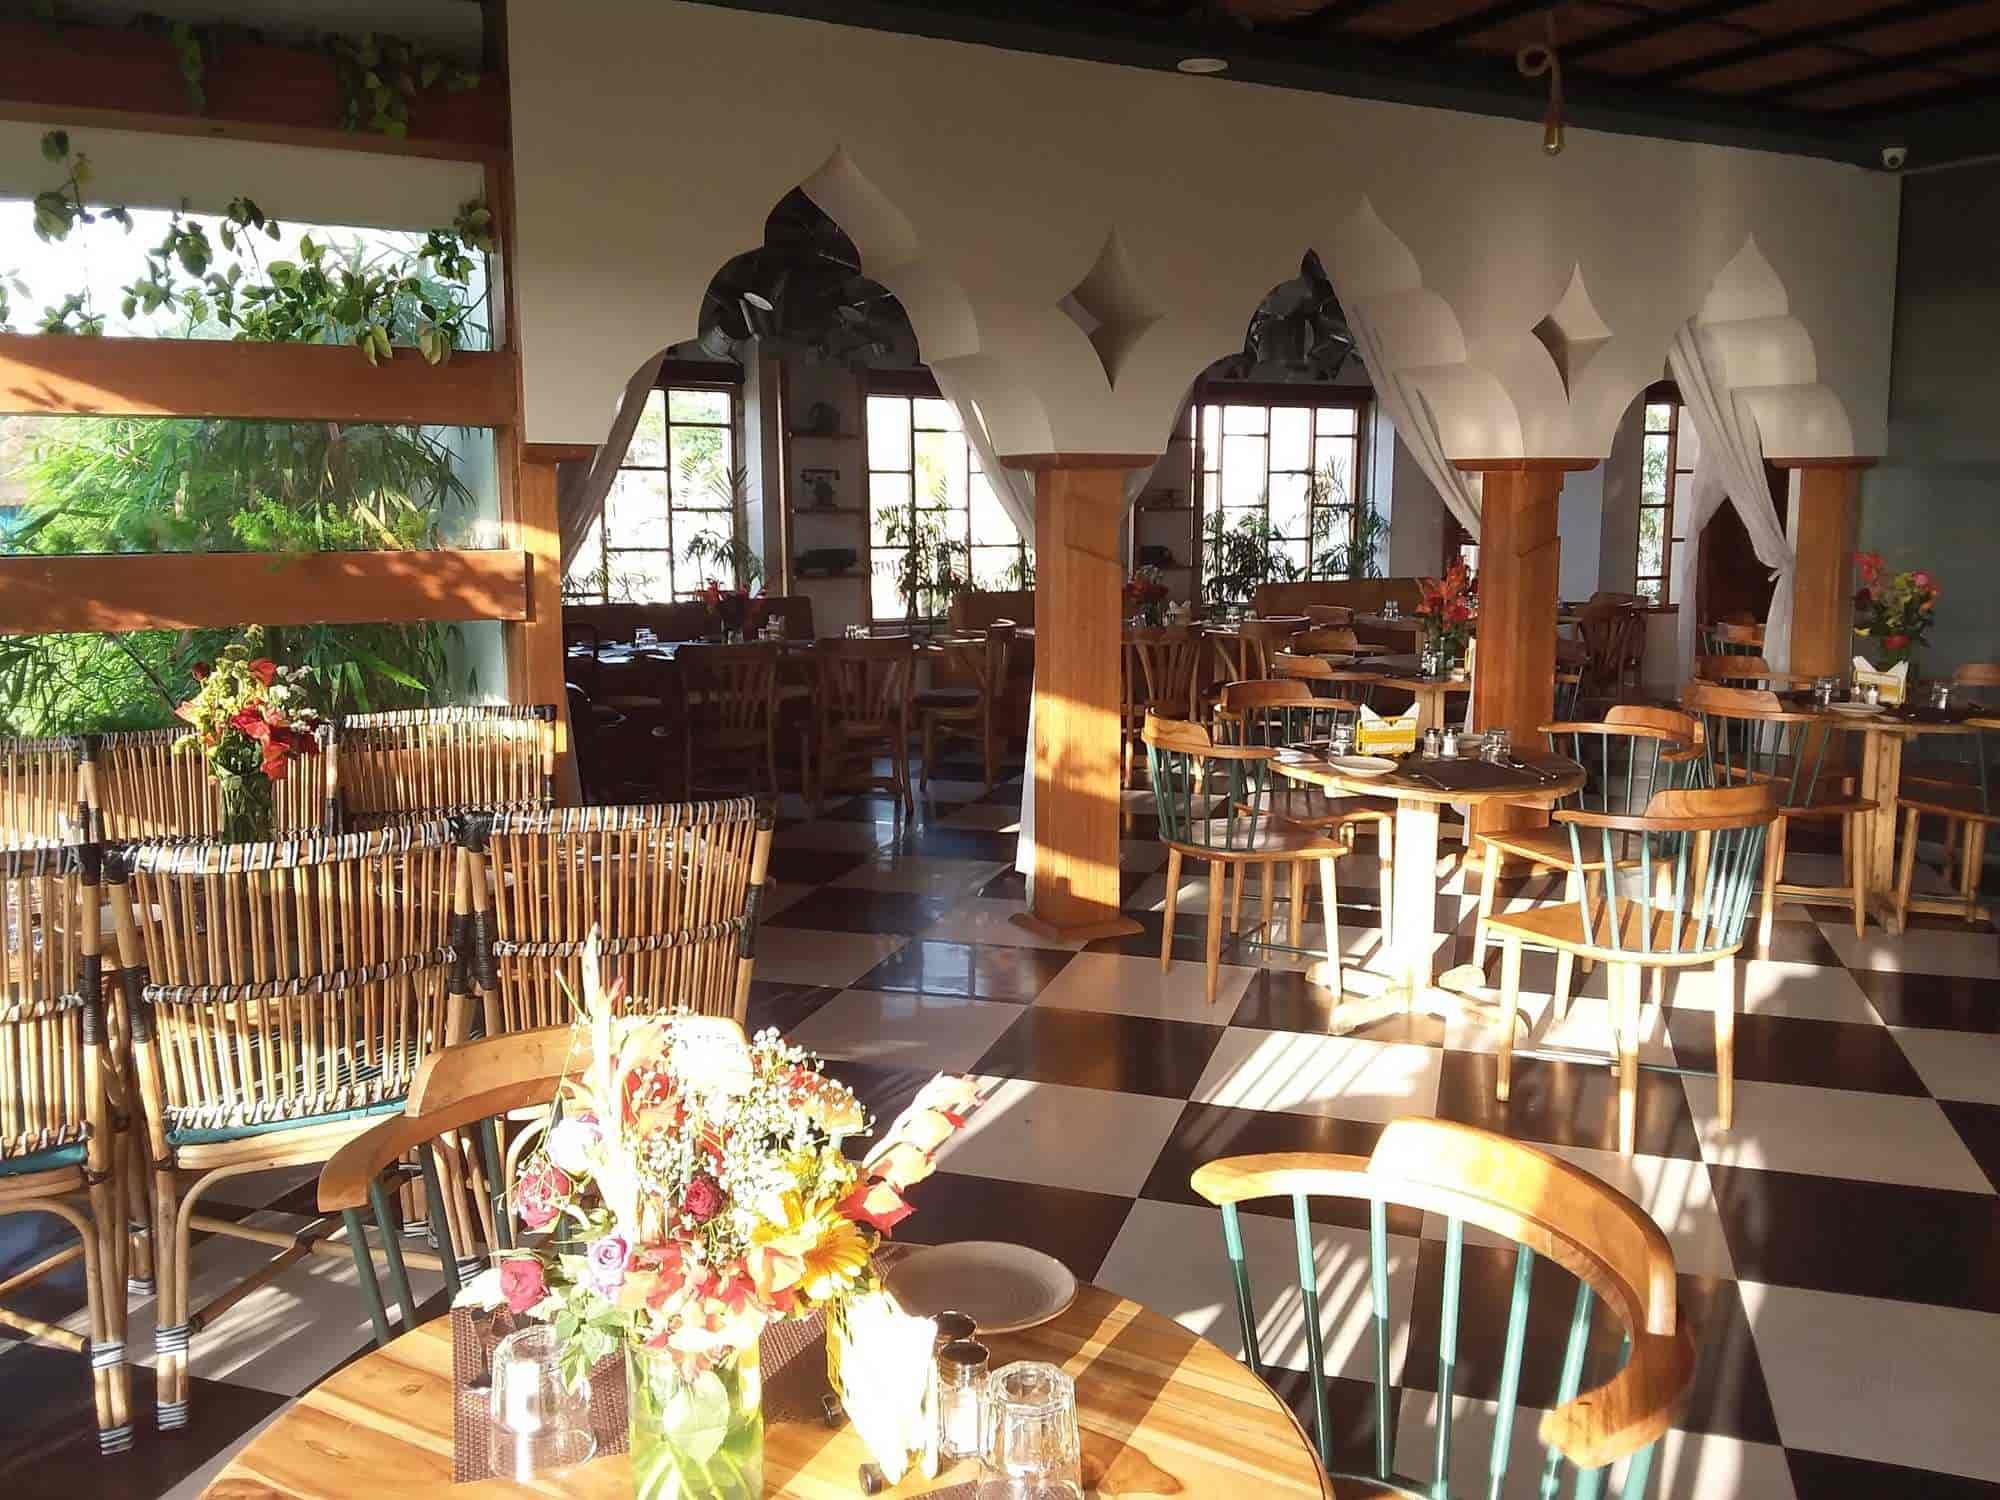 The Wild Leaf Resort Baro S Restaurant Cantt Resorts In Meerut Justdial